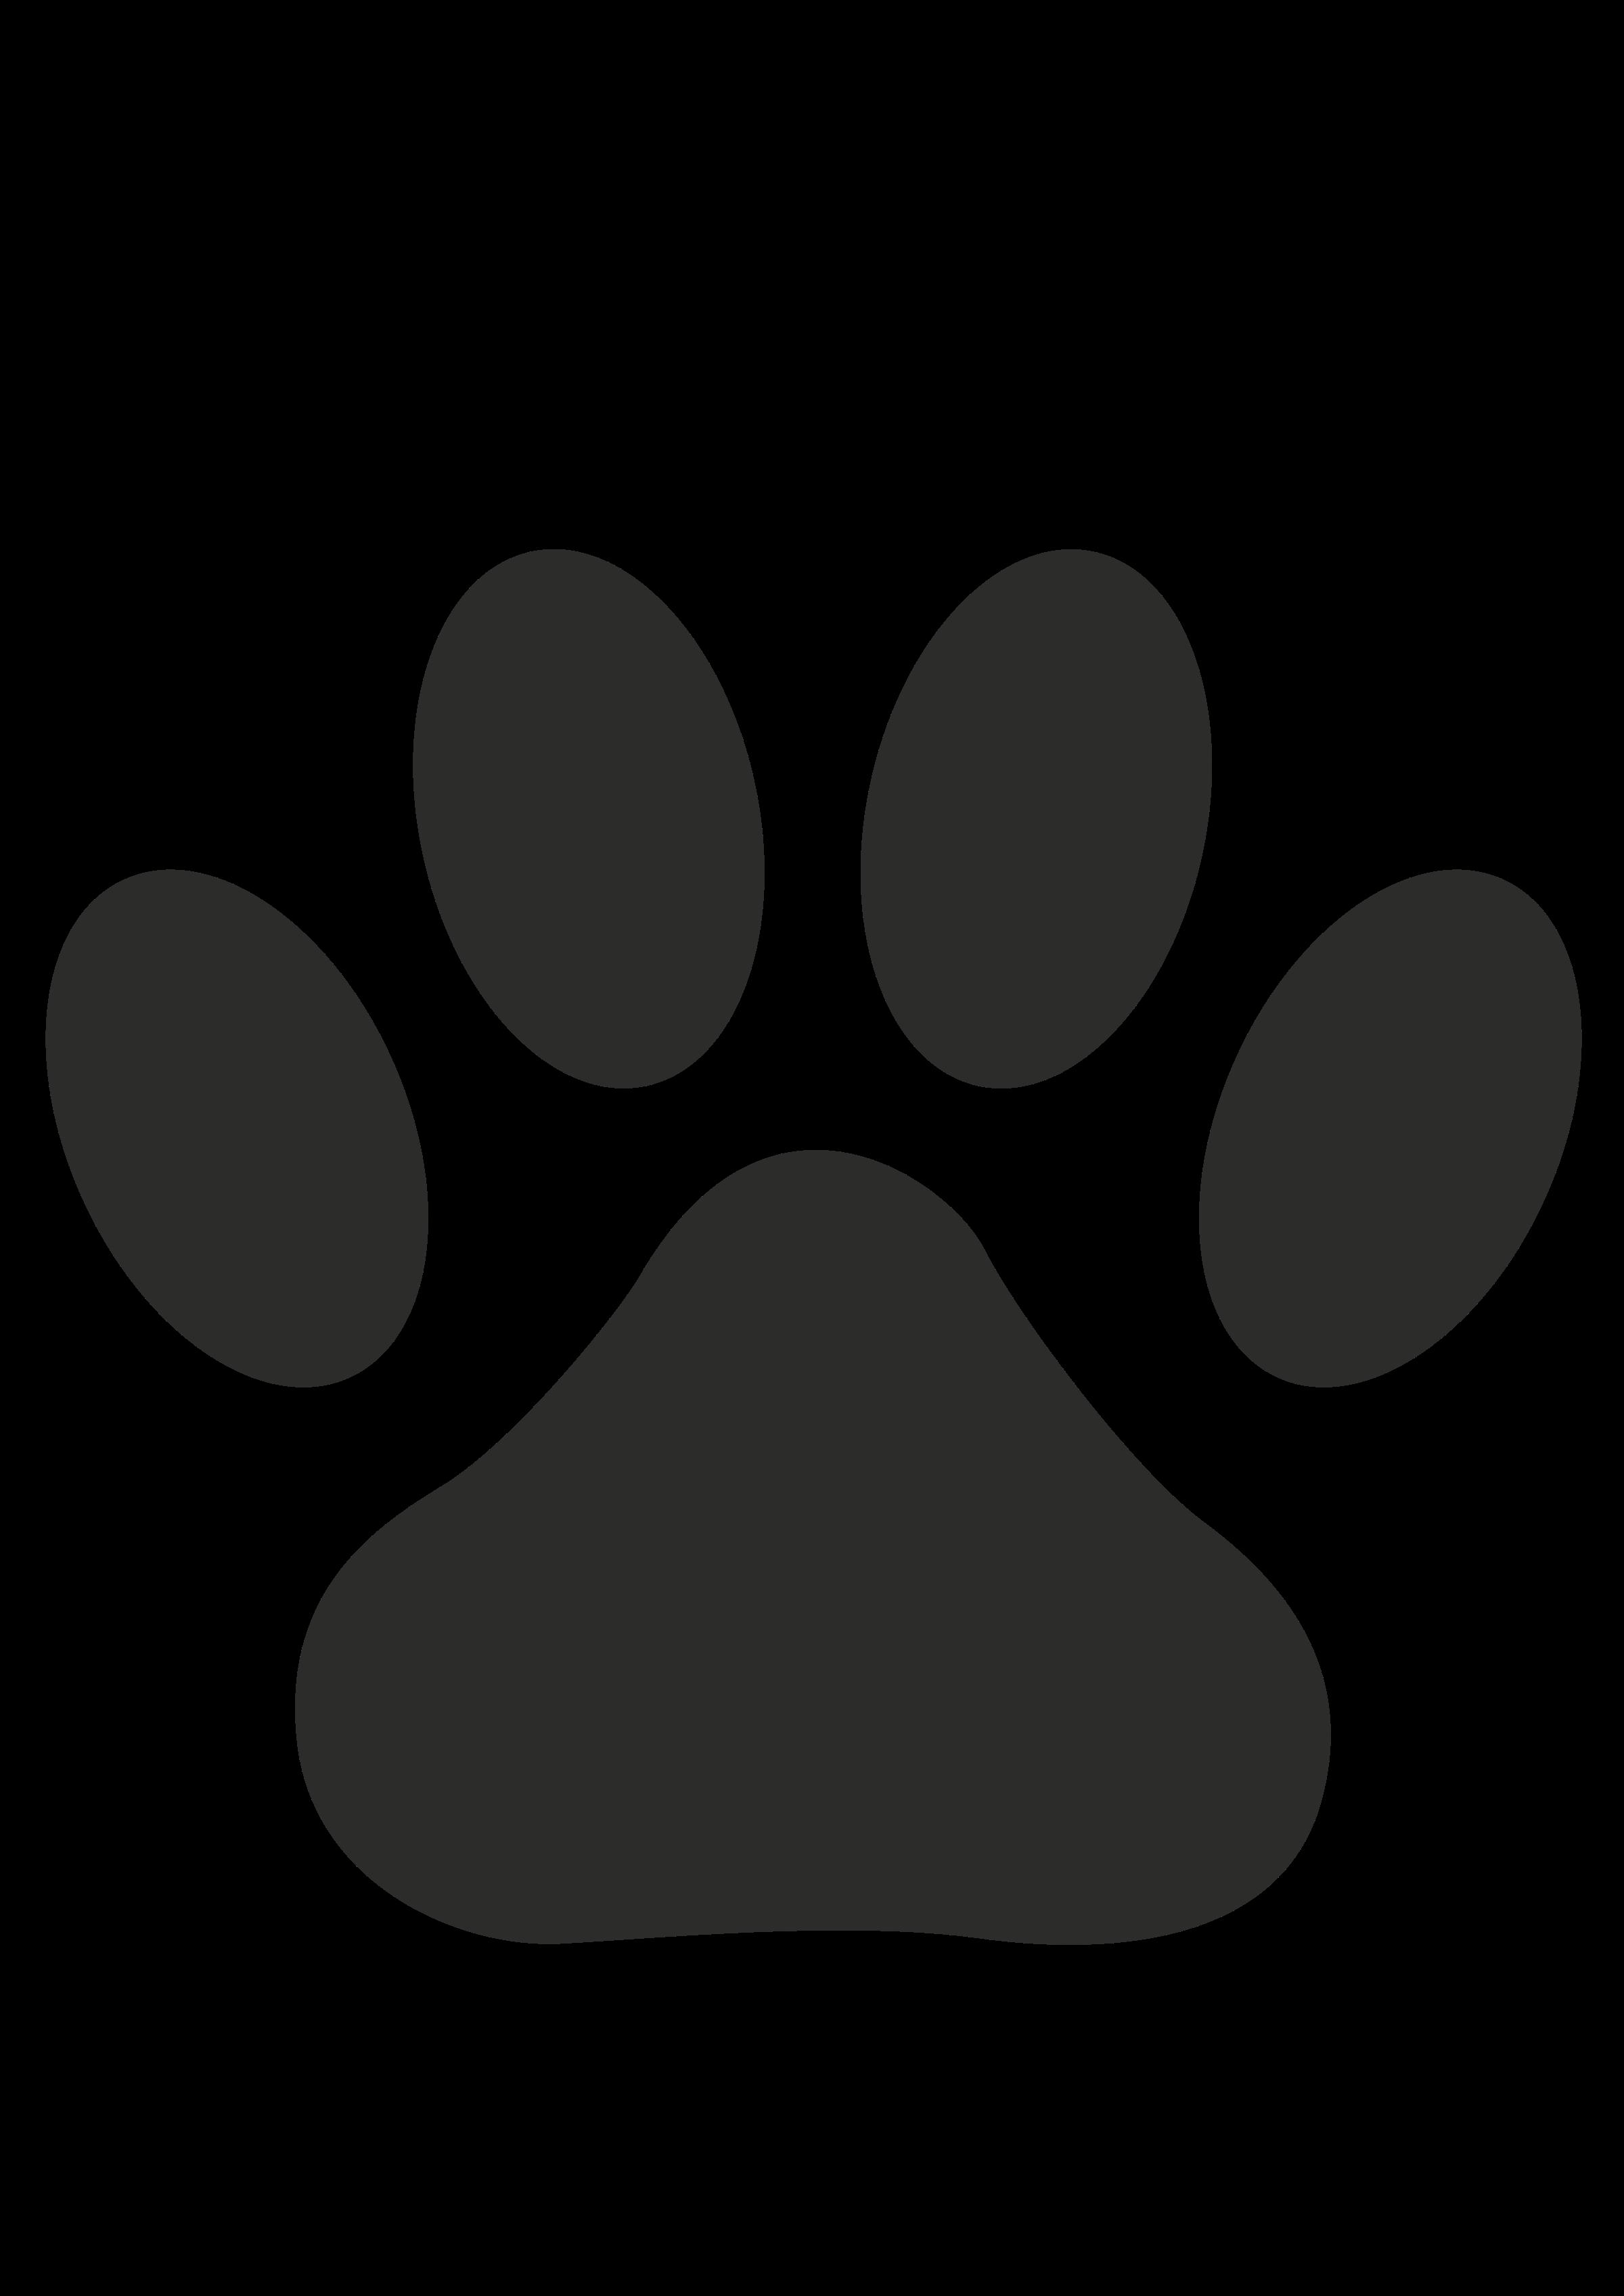 Wildcat clipart bear claw. Paw print big image